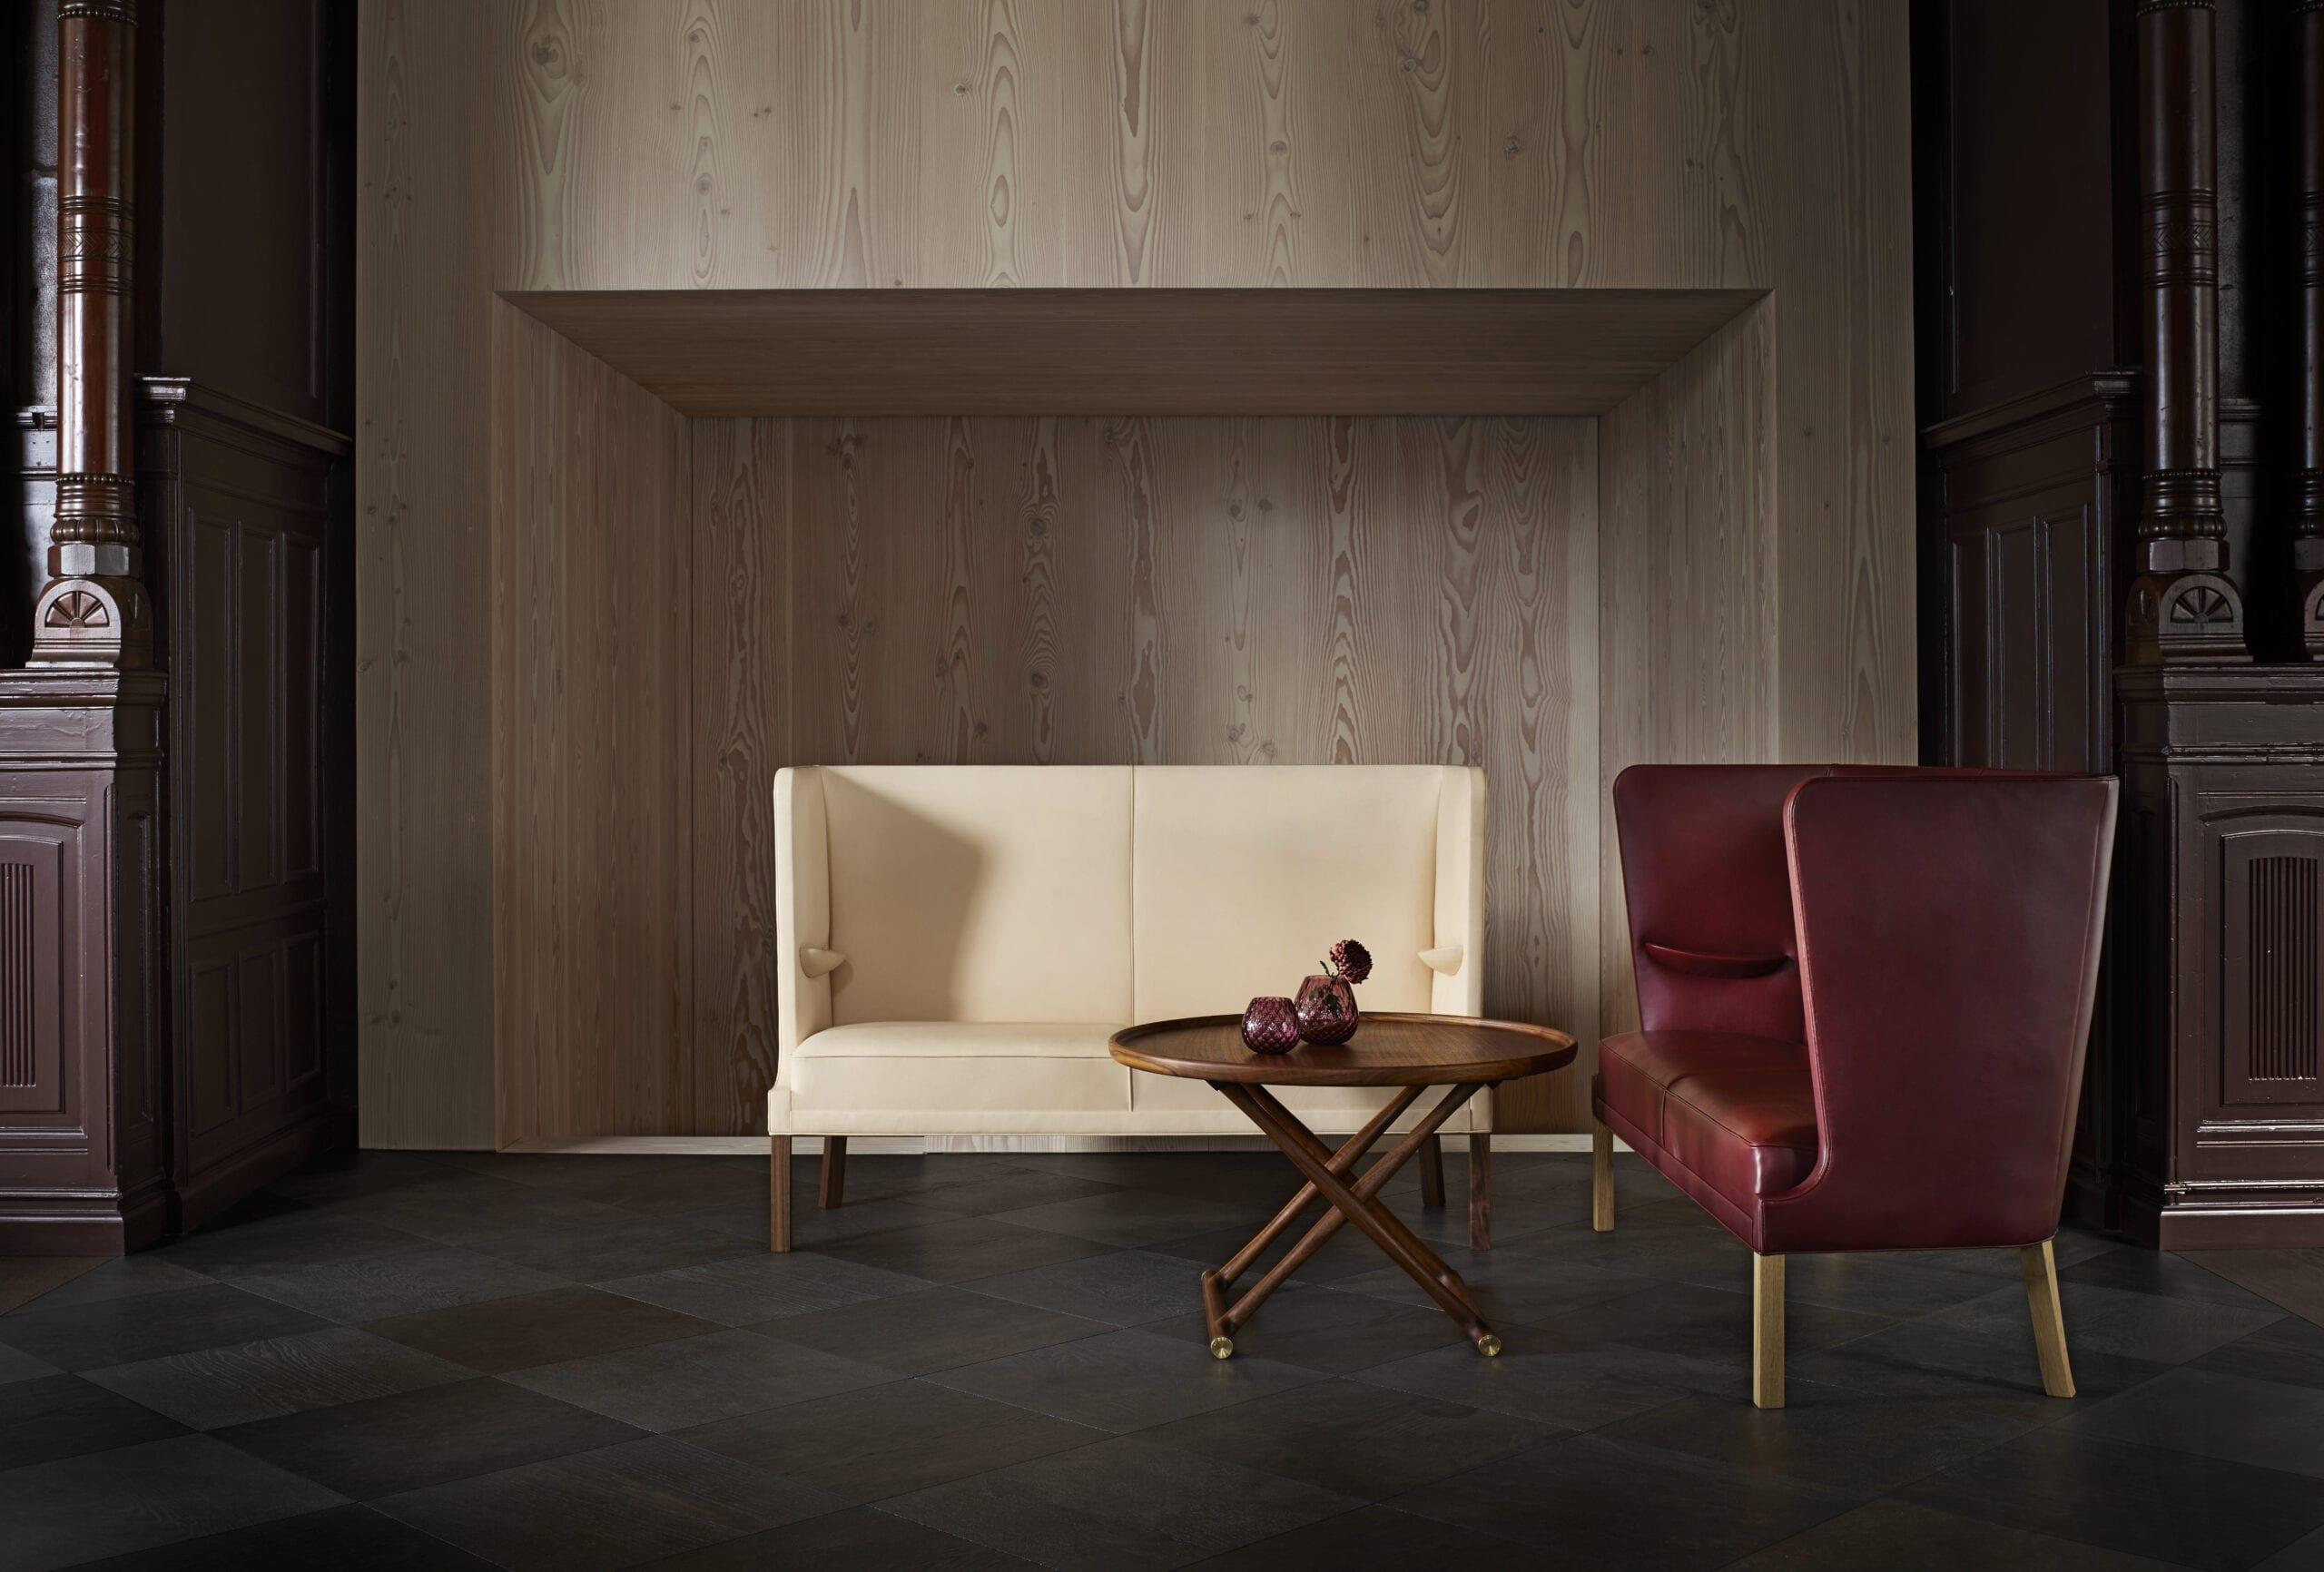 Coupé sofa FN436 Frits Henningsen Carl Hansen Indbo